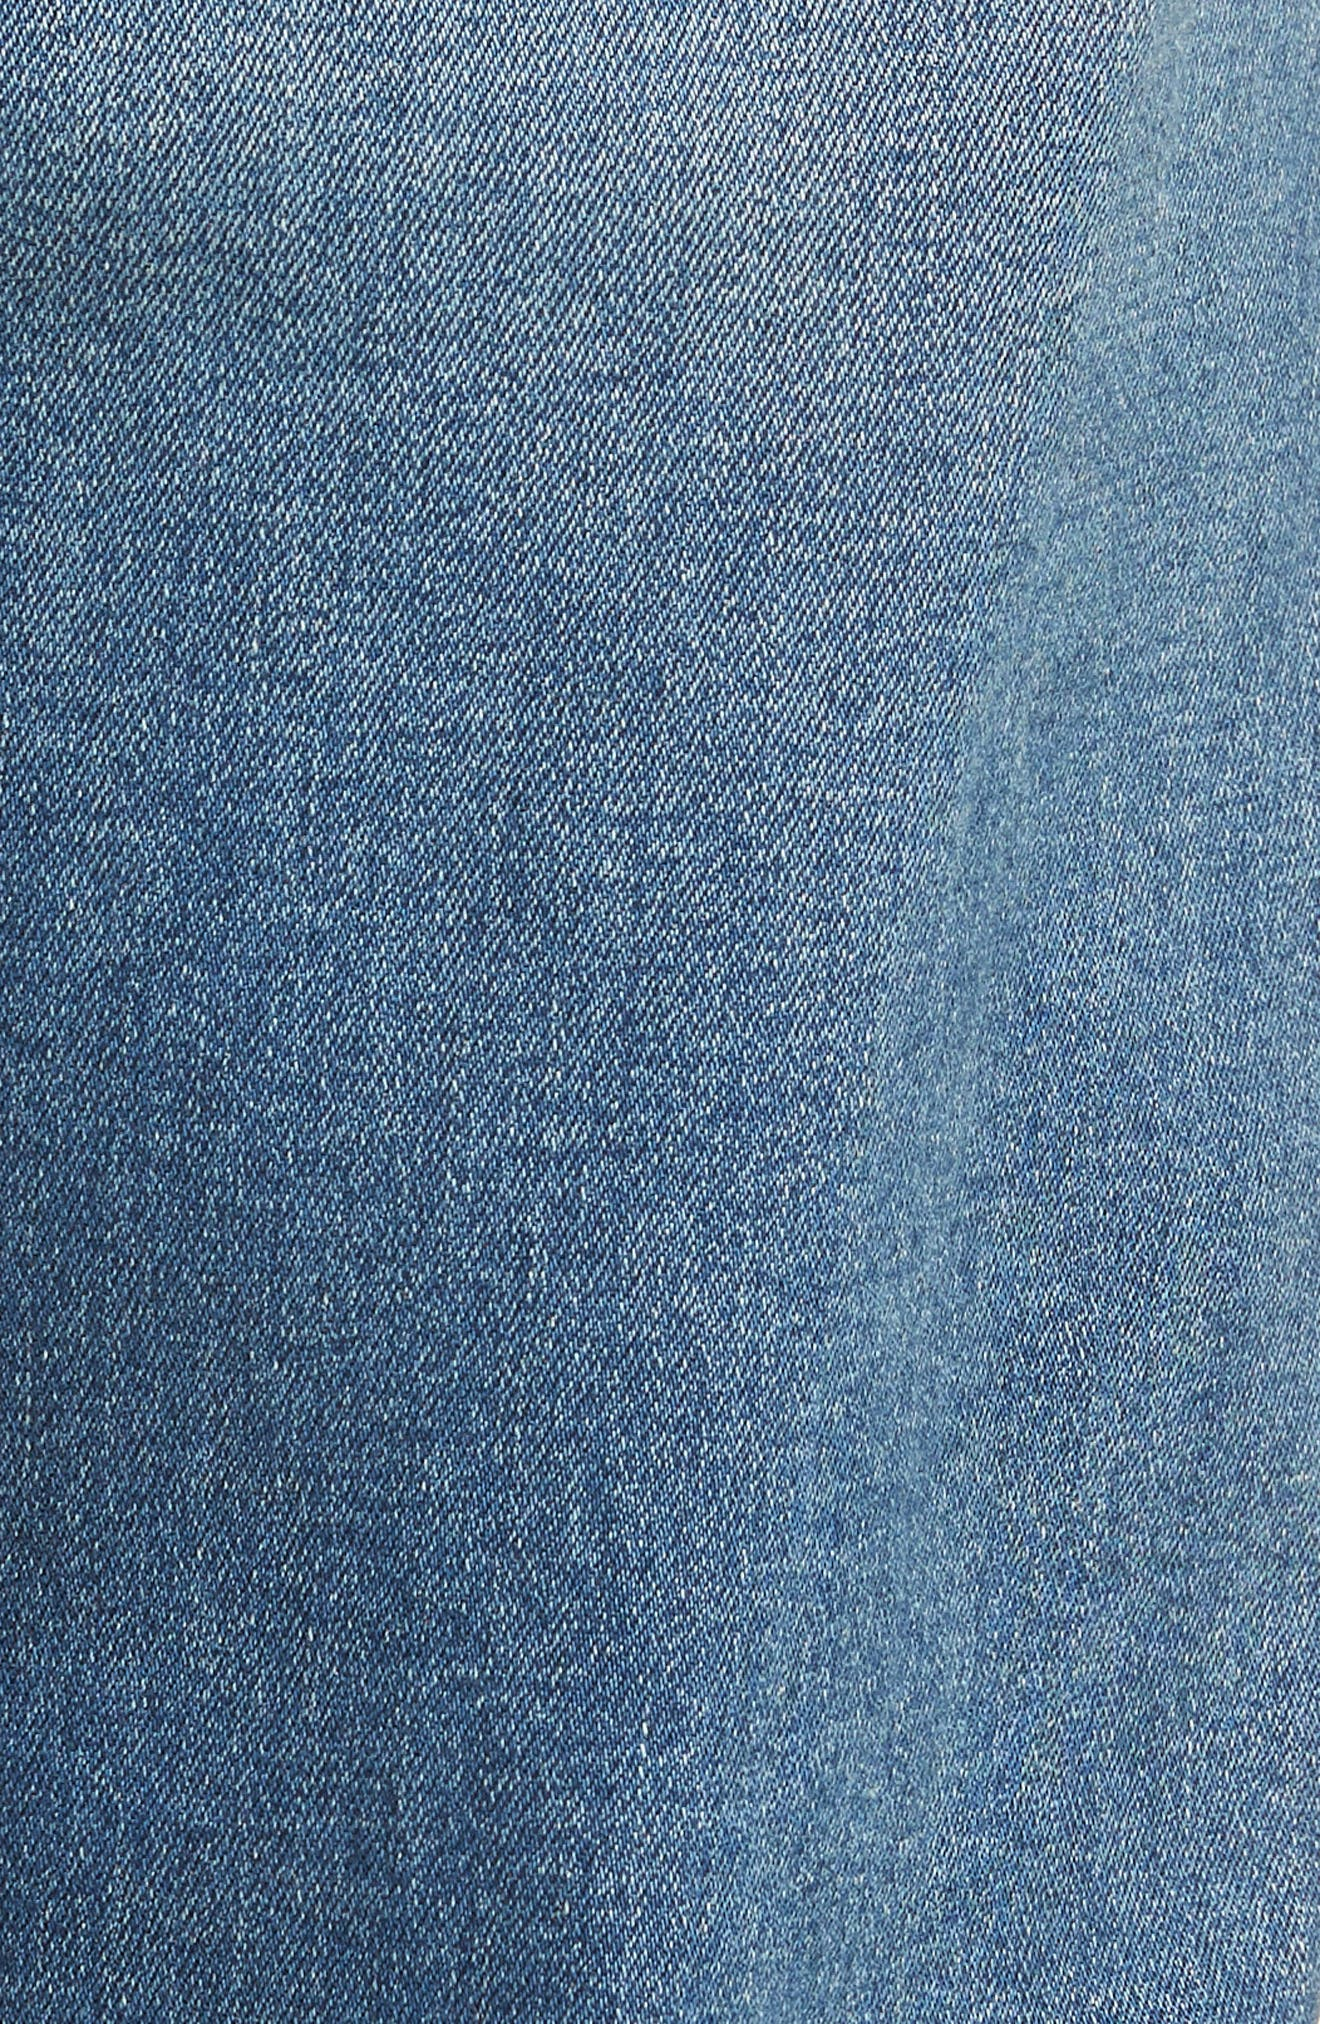 Gage Slim Straight Leg Jeans,                             Alternate thumbnail 5, color,                             Hemingway